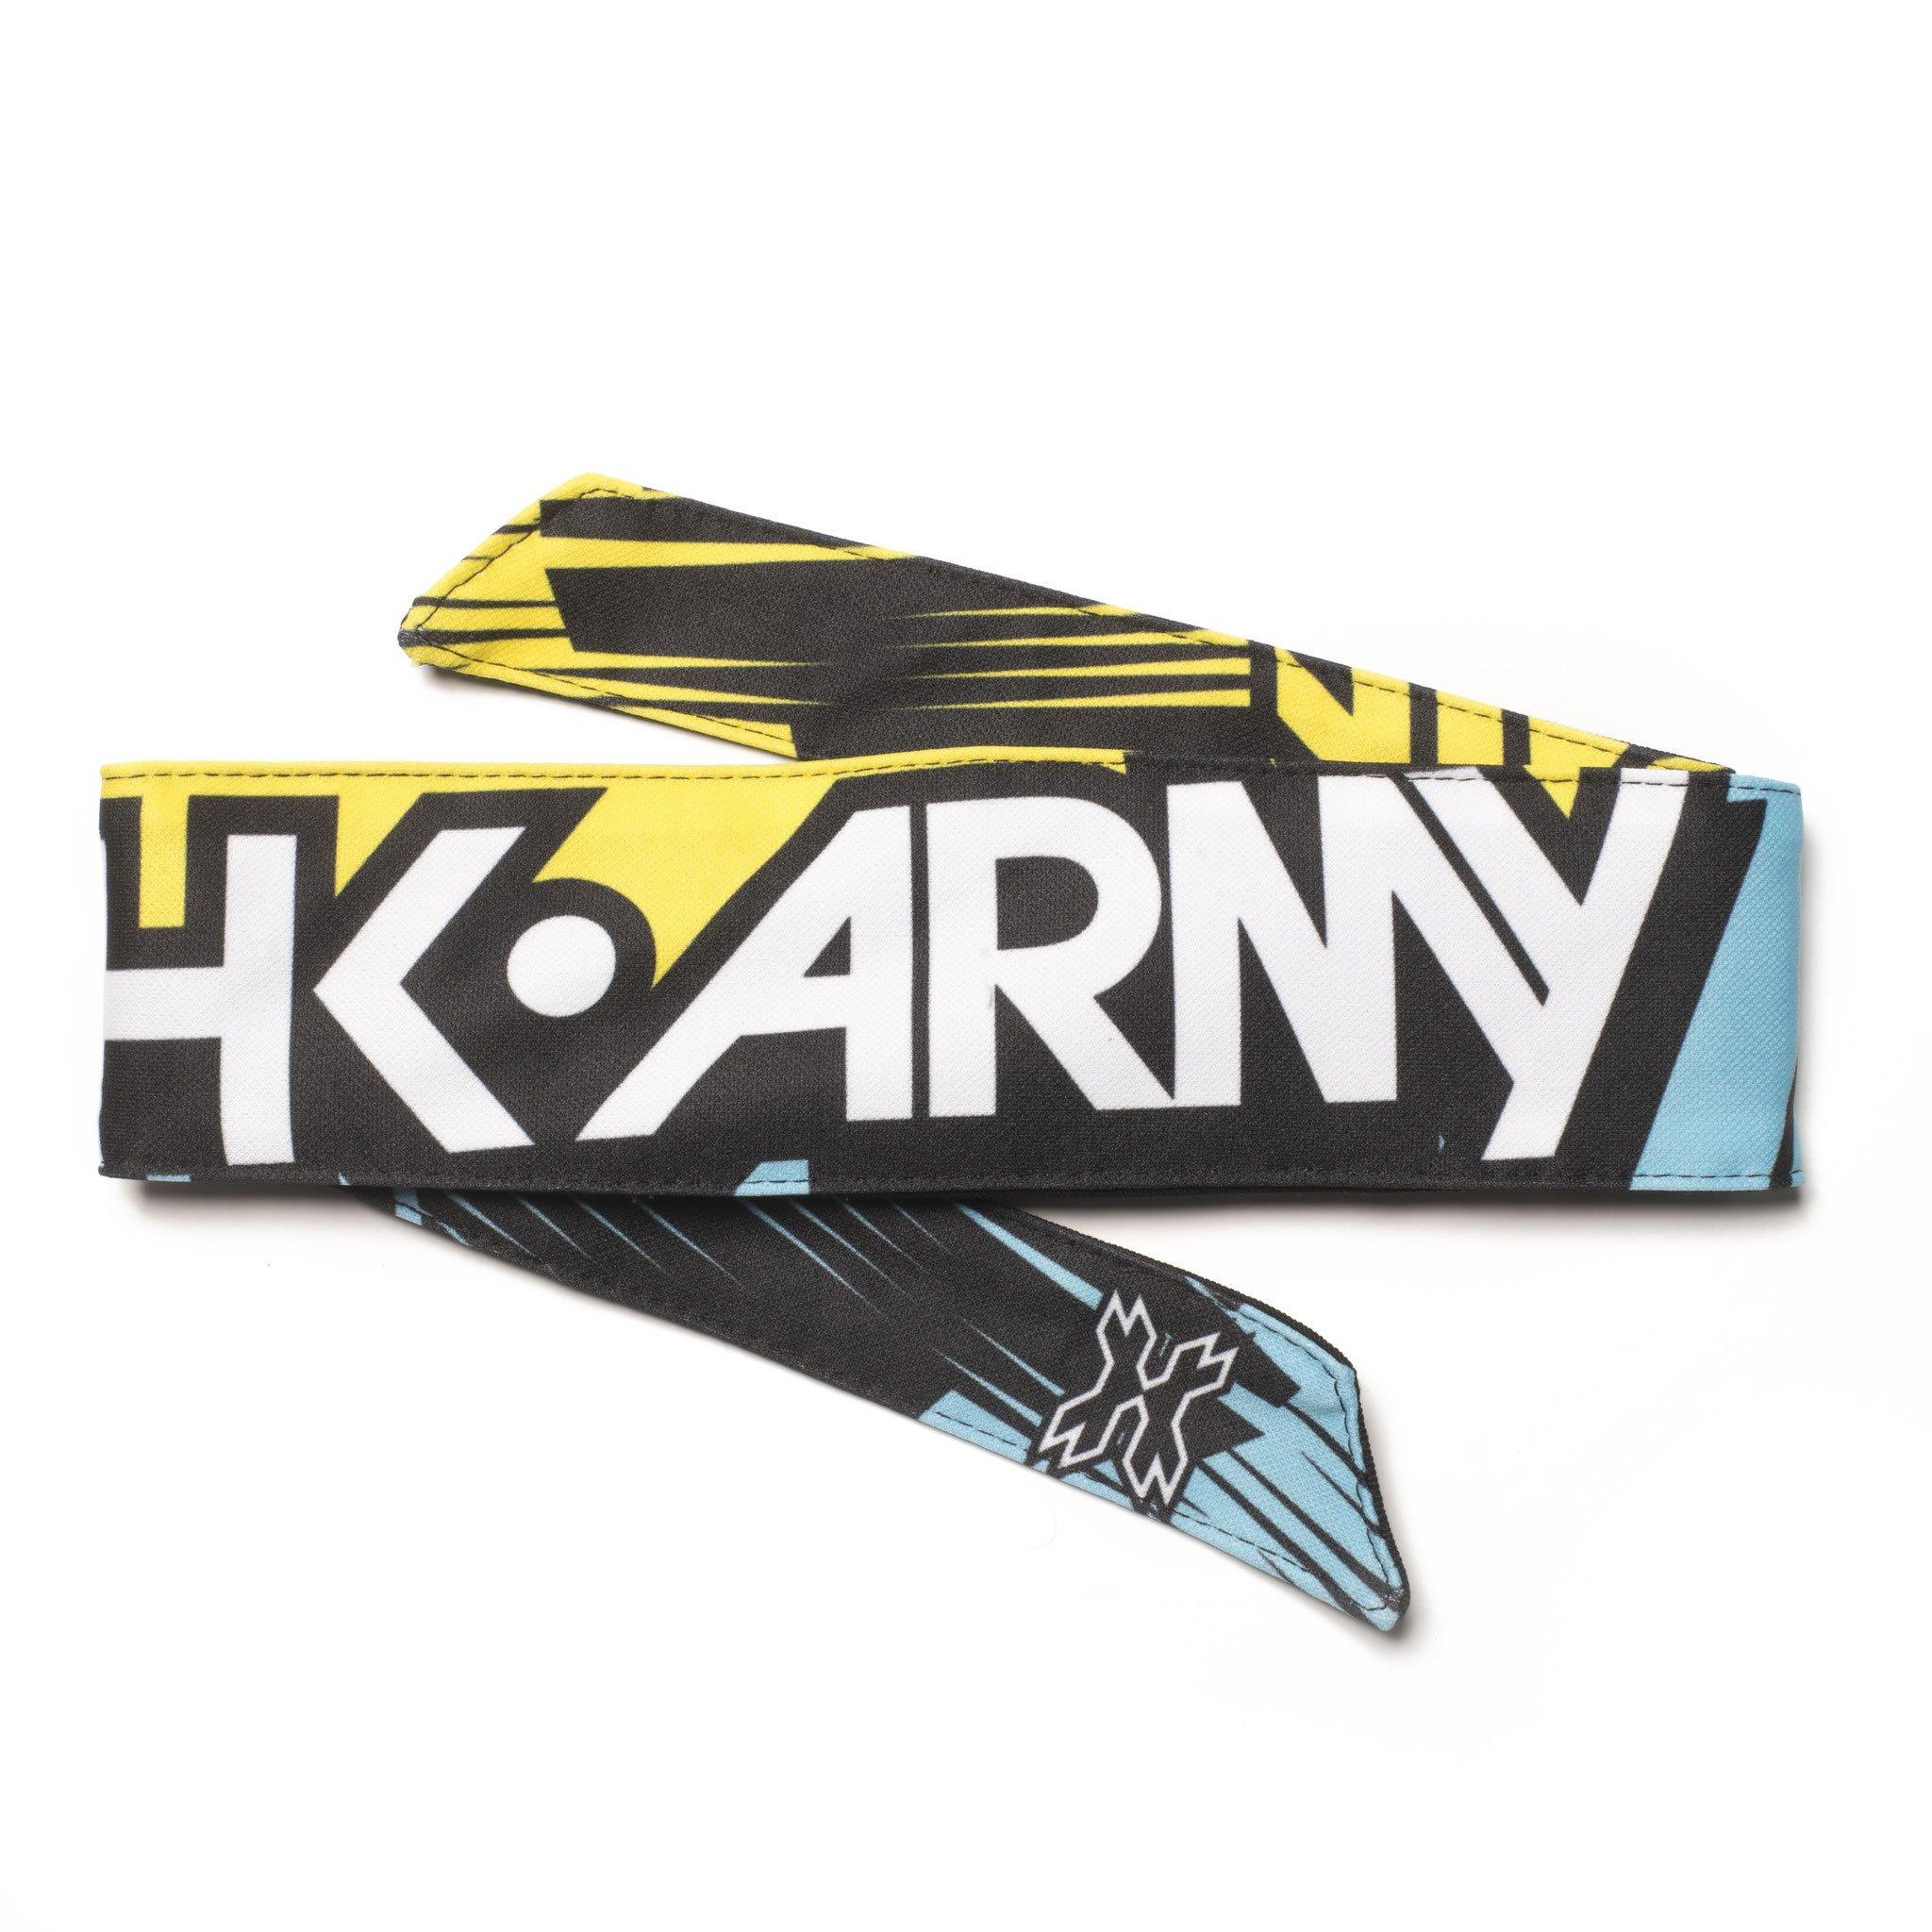 HK Army Headbands (Apex Yellow) by HK Army